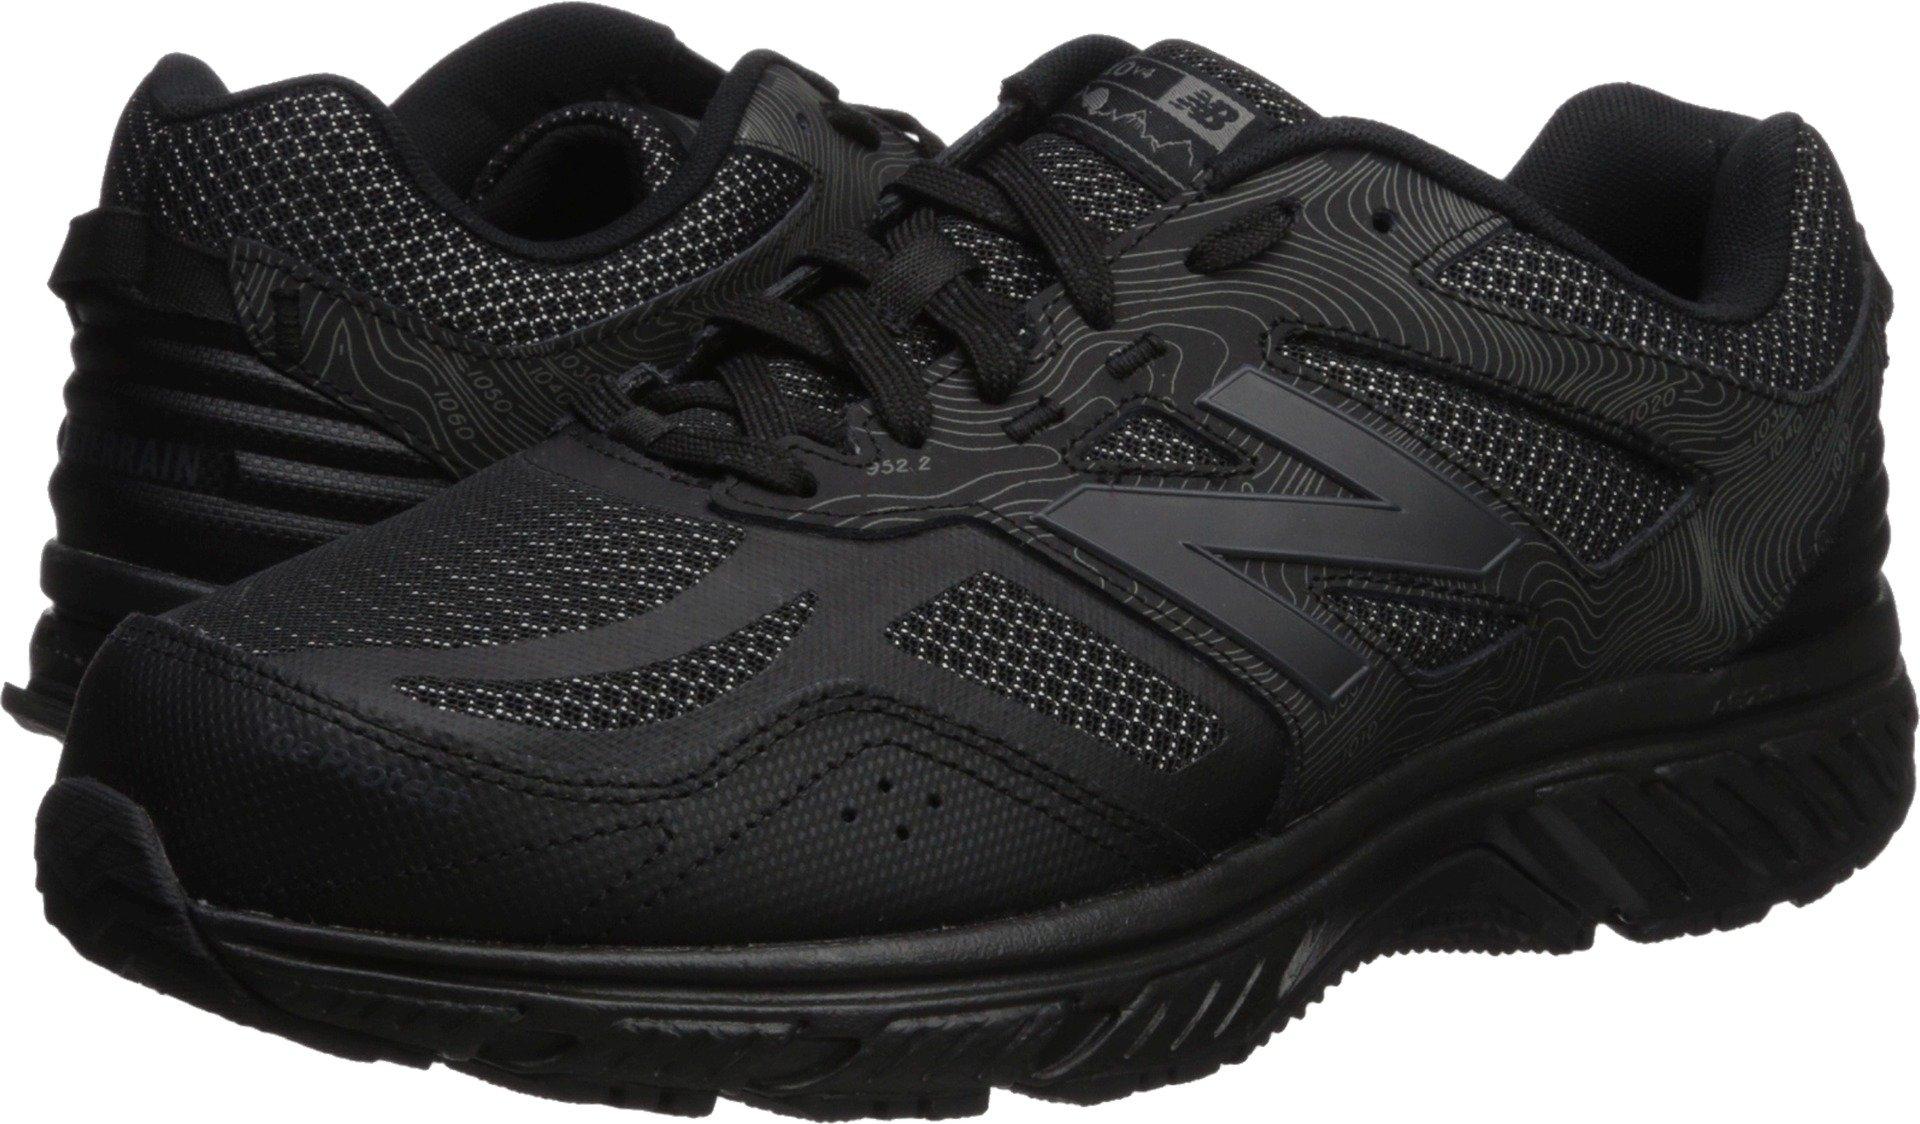 New Balance Men's 510v4 Cushioning Trail Running Shoe, Black, 10.5 4E US by New Balance